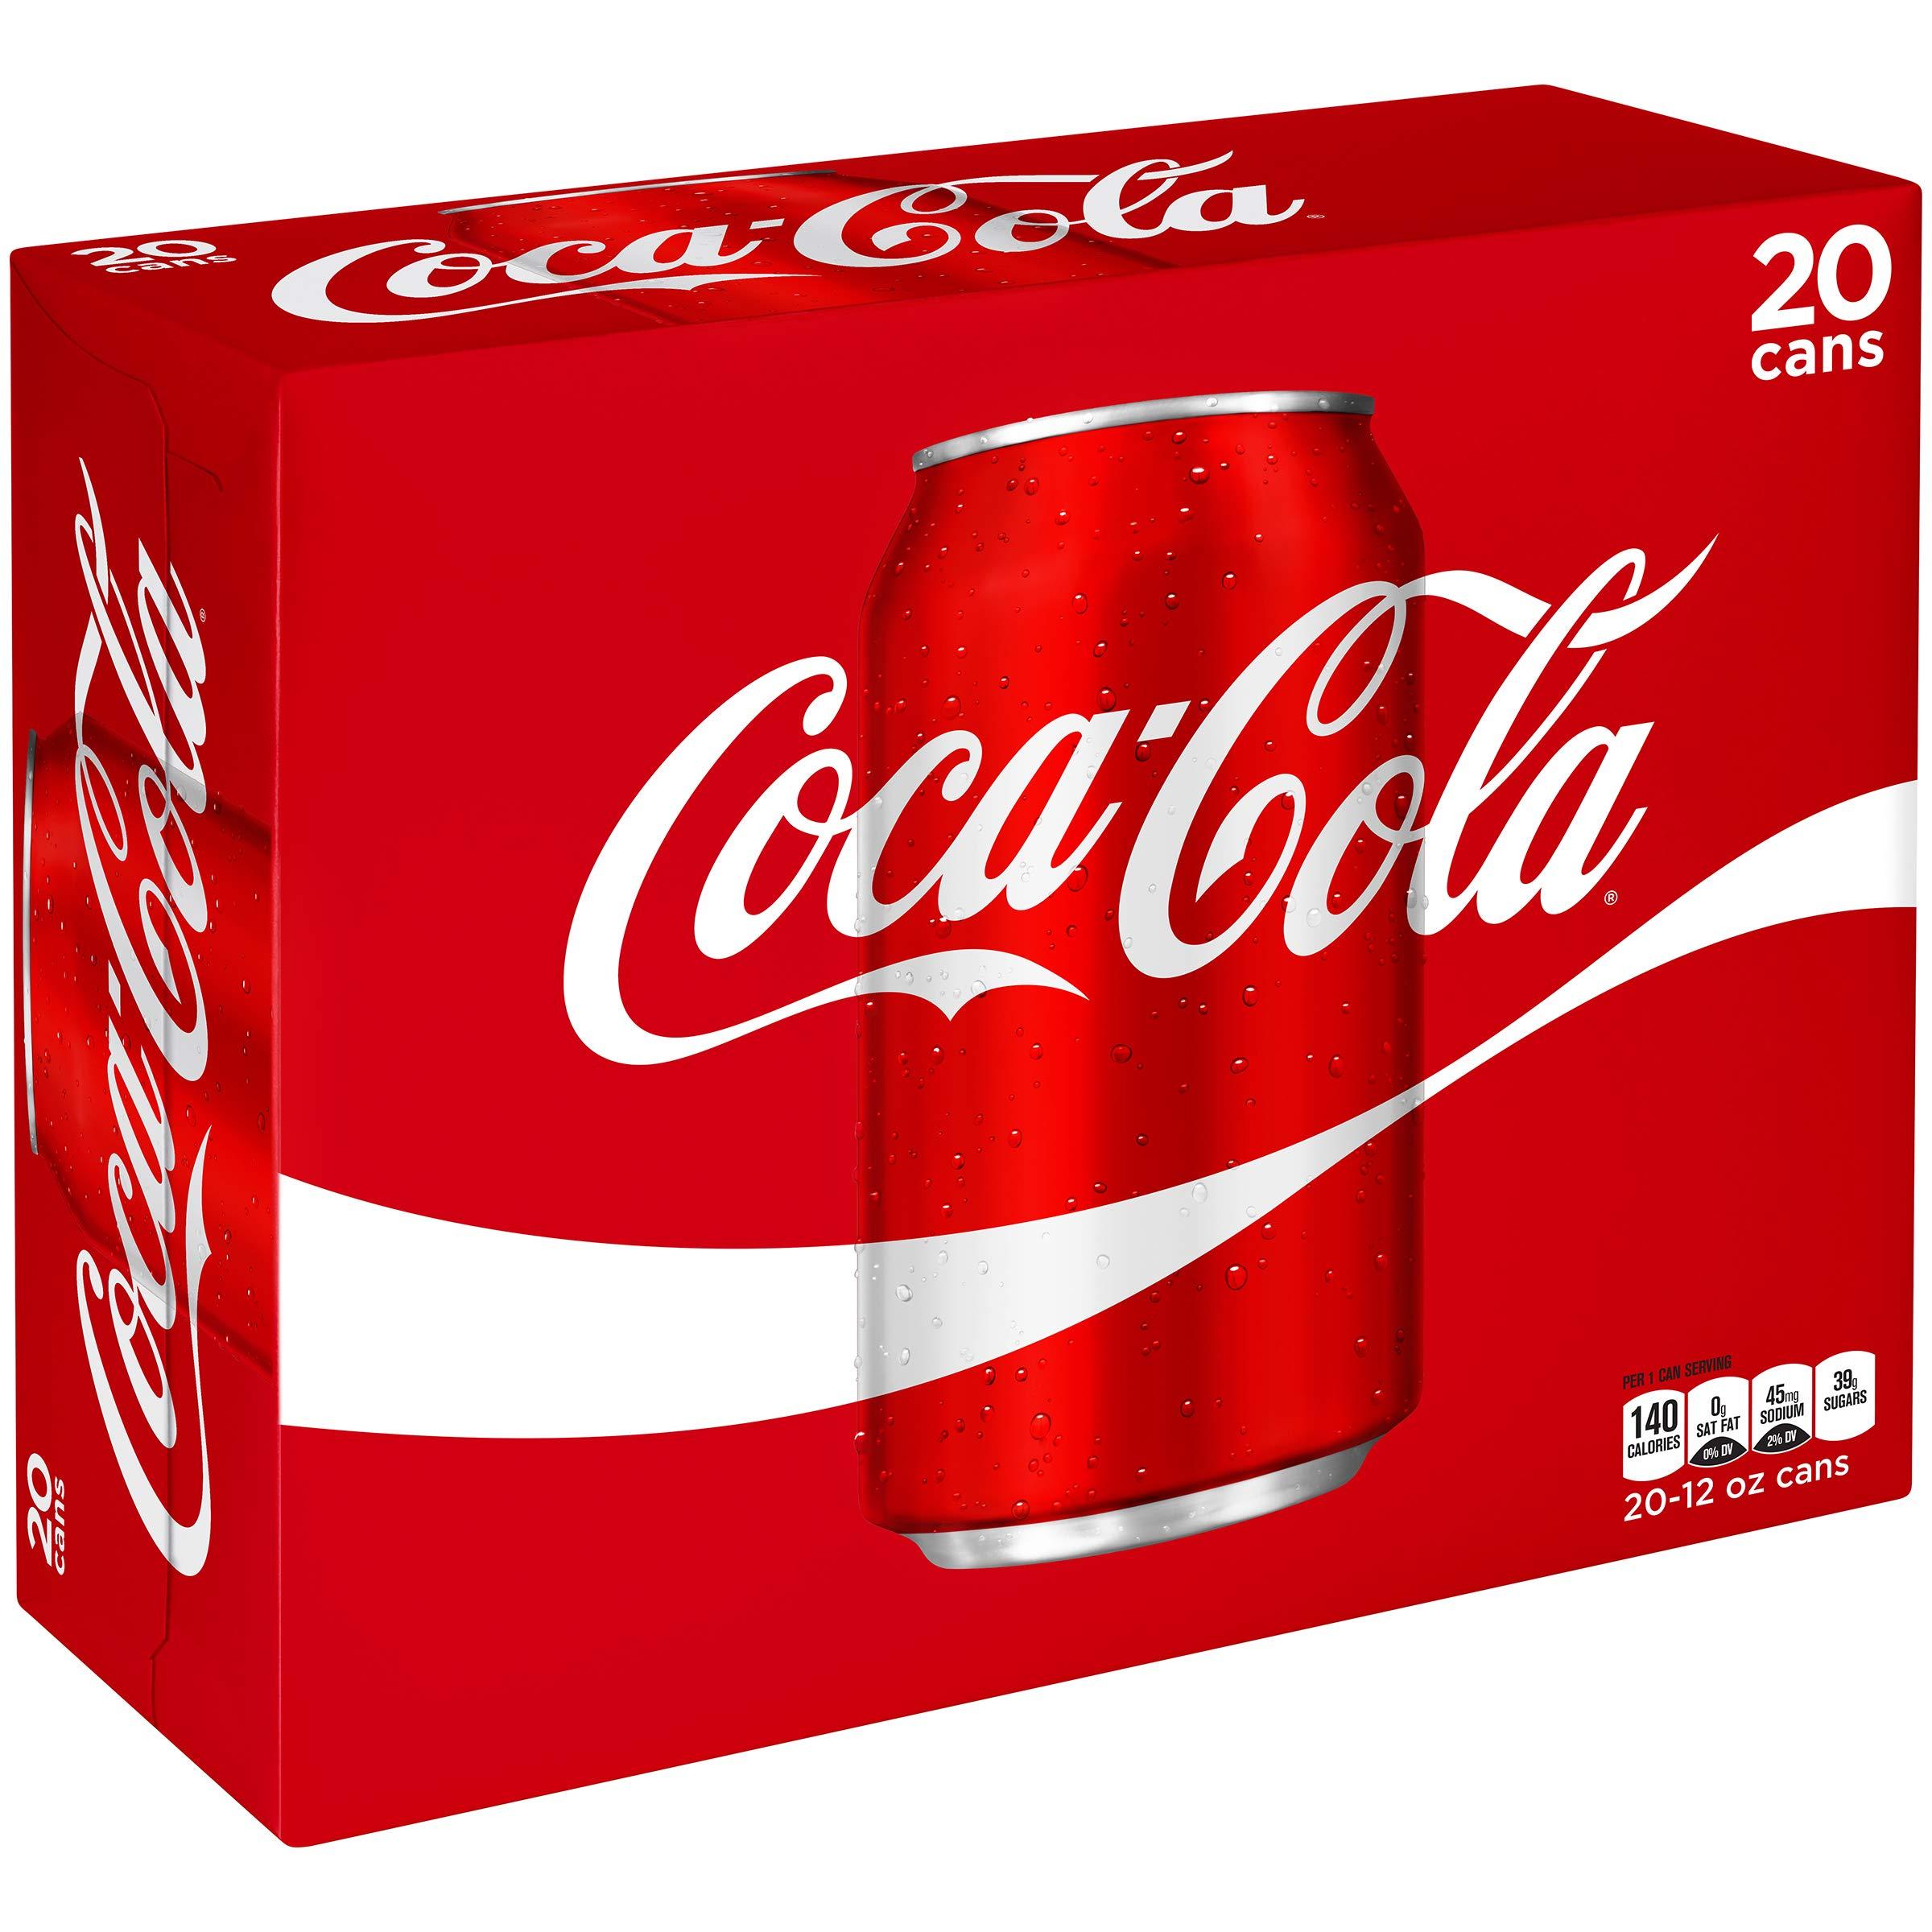 Coca-Cola Soda Soft Drink, 12 fl oz (pack of 20)